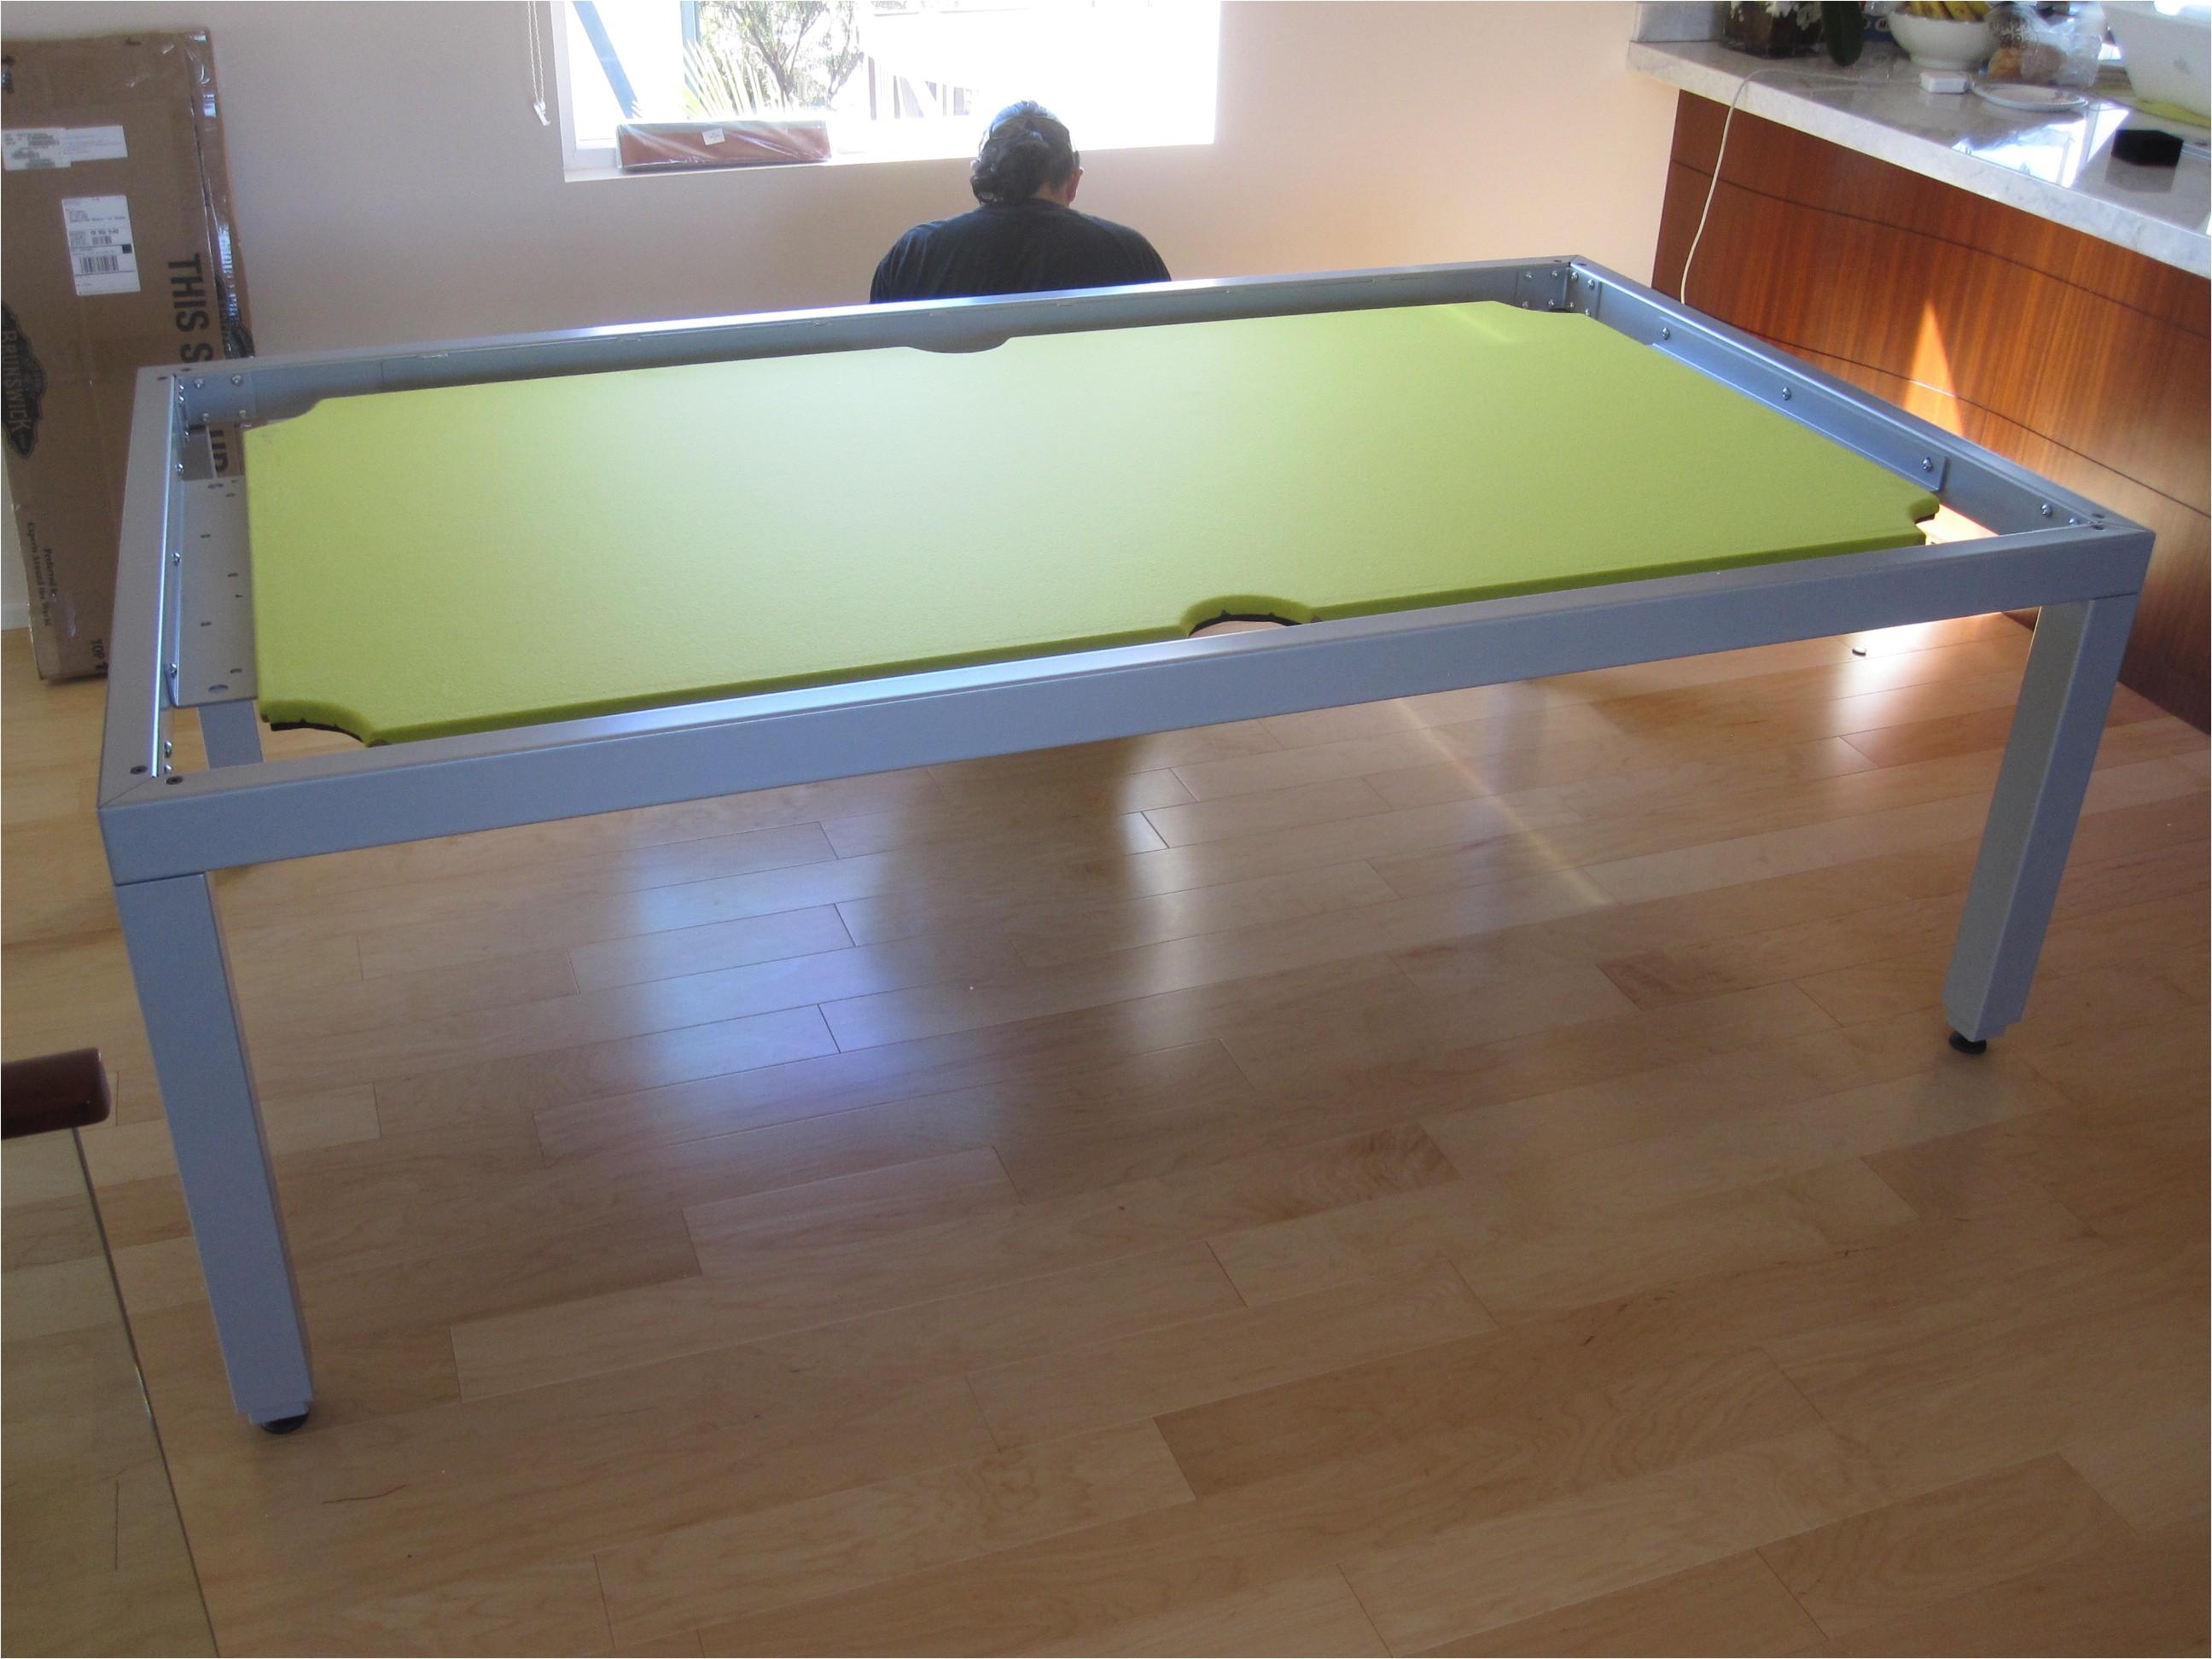 aramith fusion table with a lime twist dk billiard service pool tables for sale billiard supplies orange ca